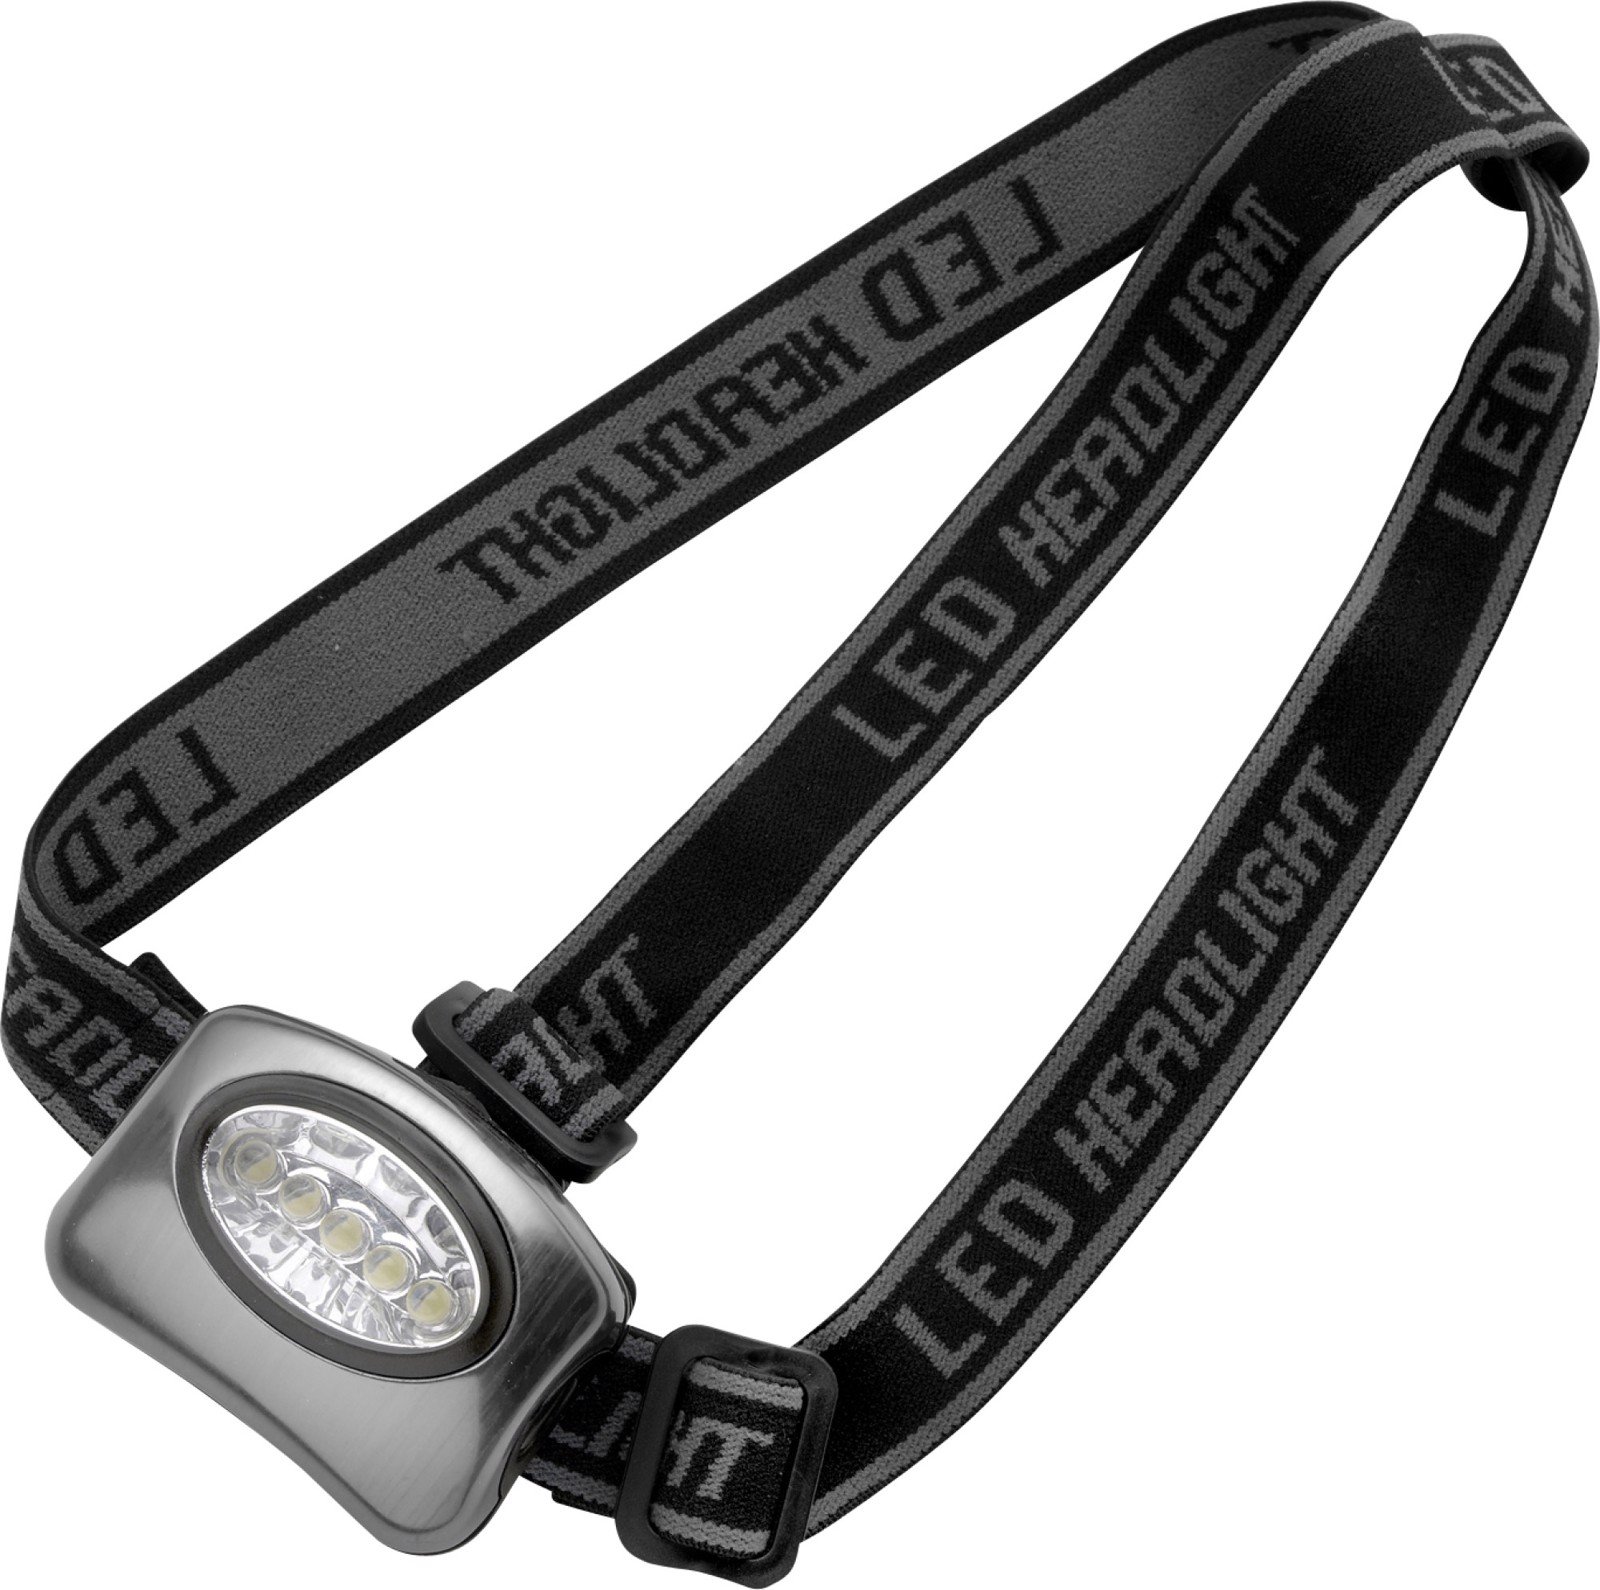 Aluminium head torch - Silver